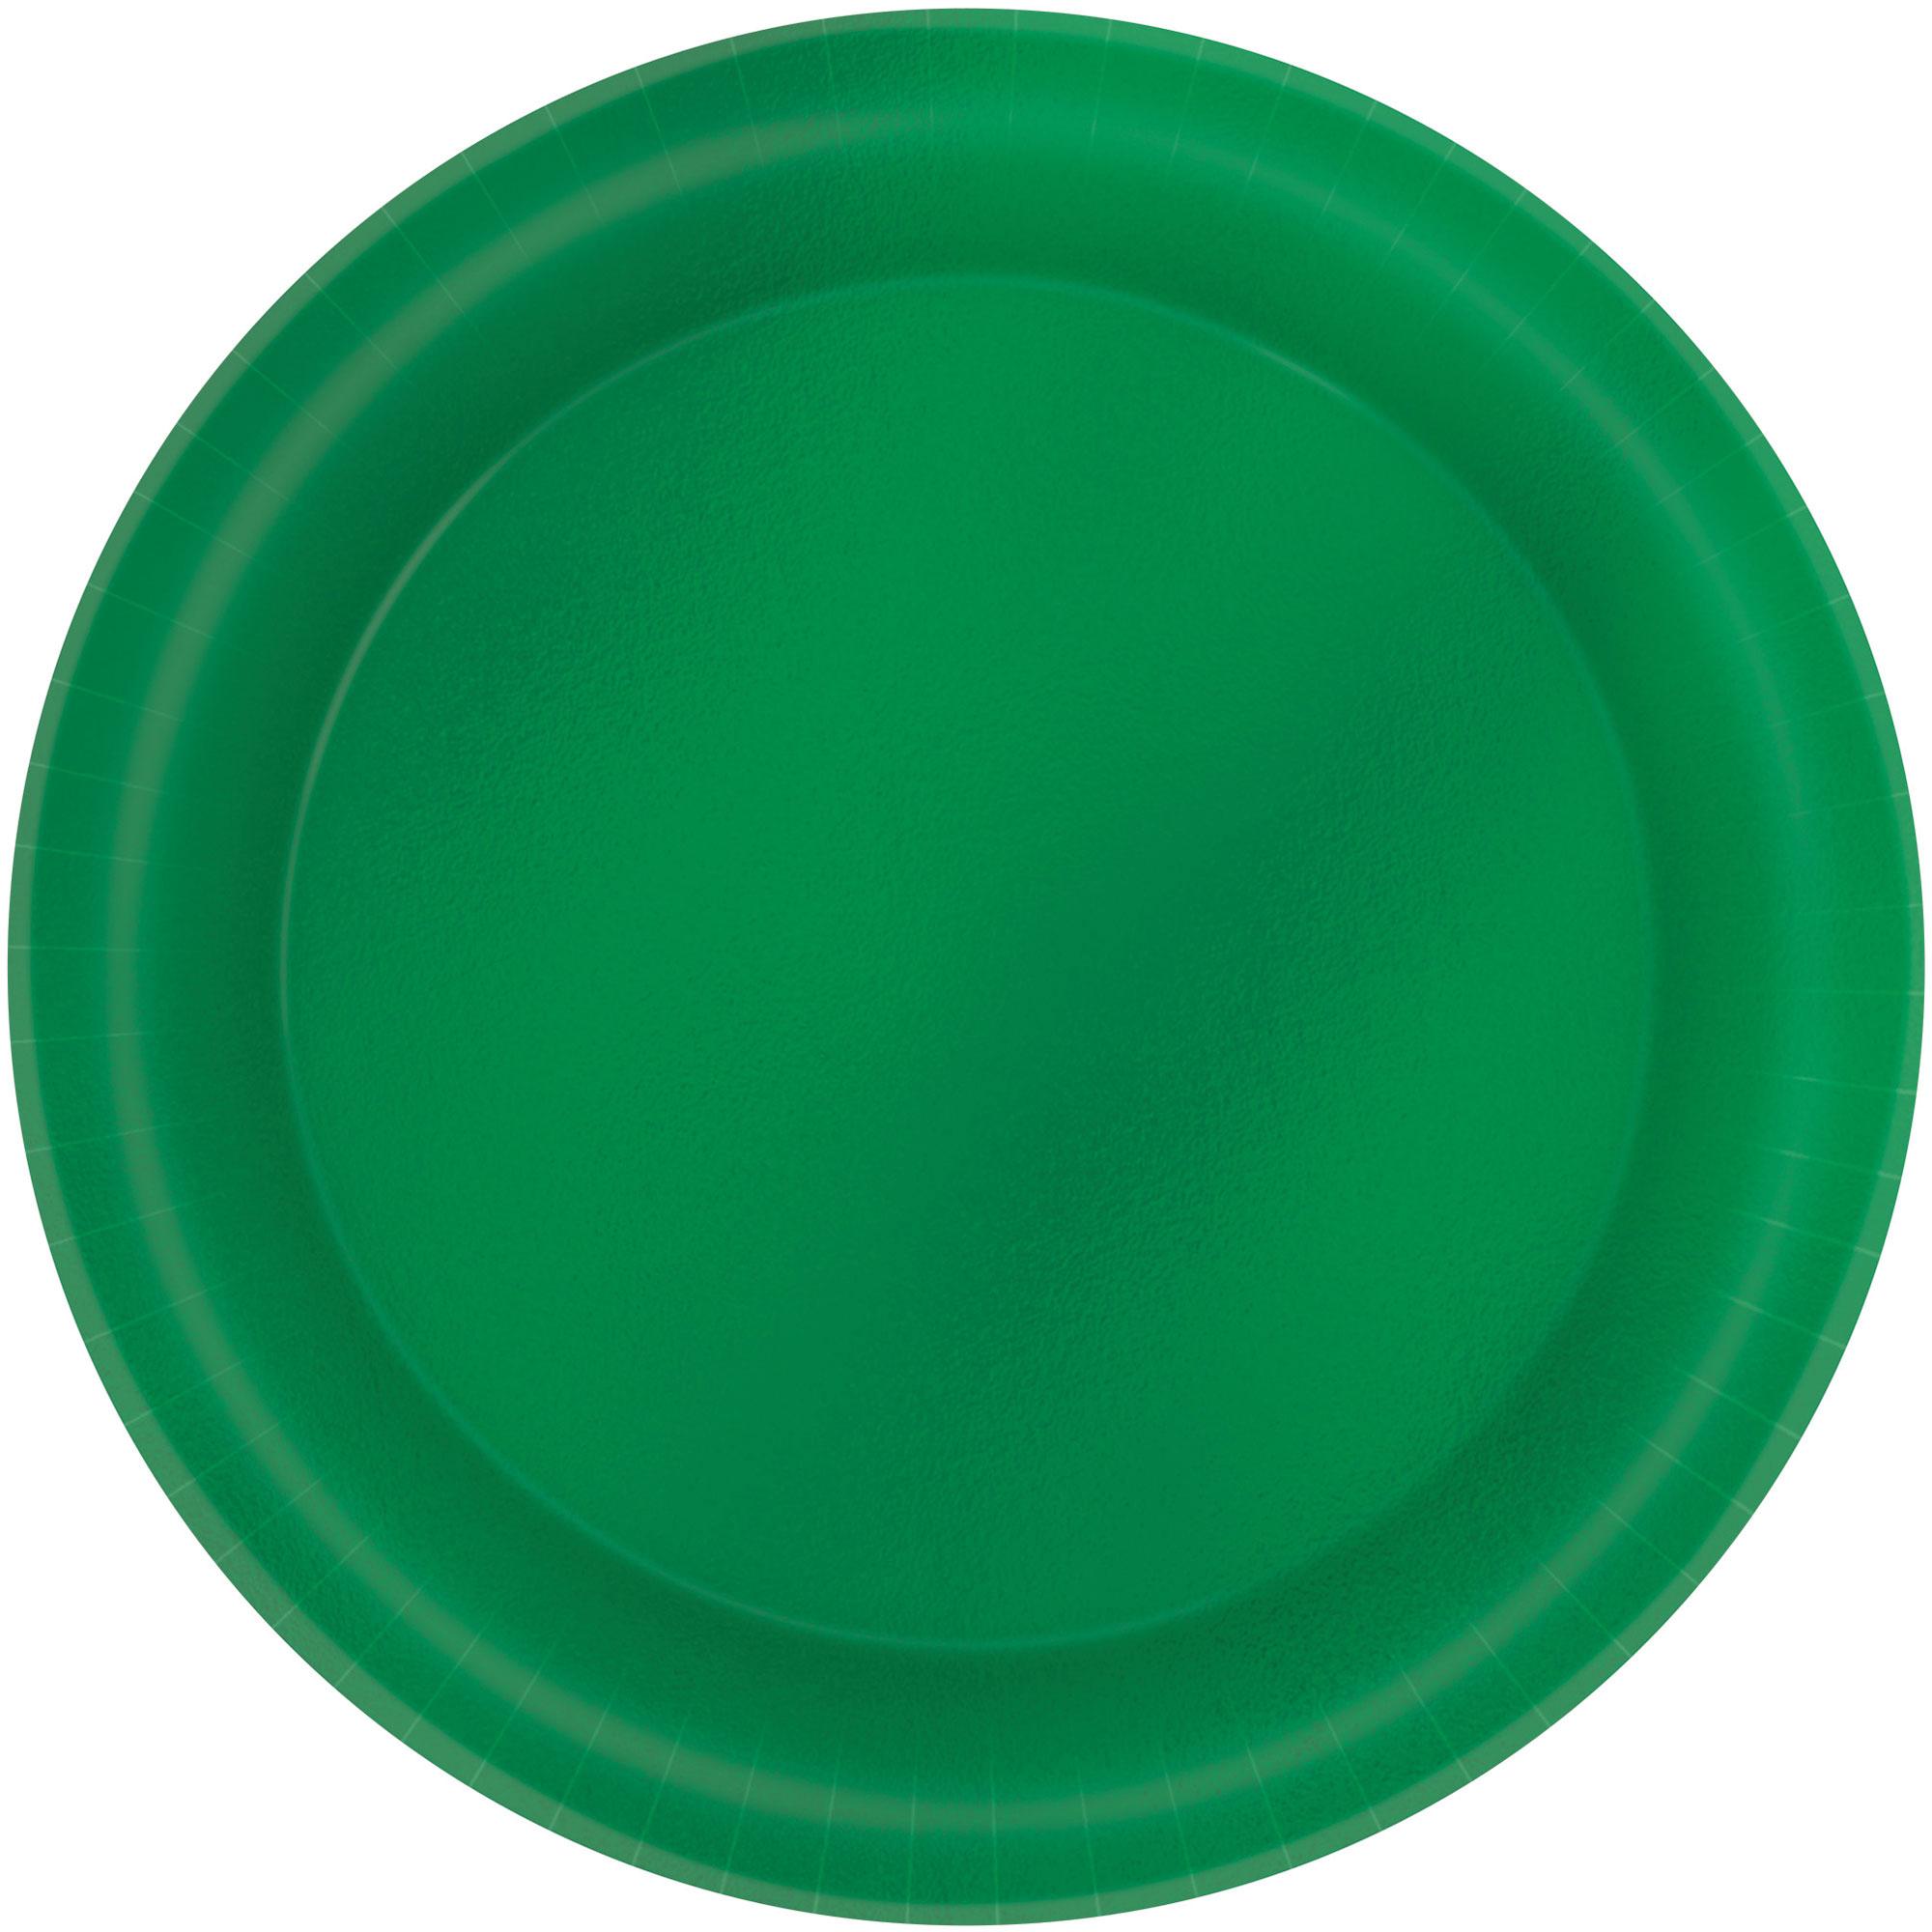 Metallic 17cm Festive Green Round Plates